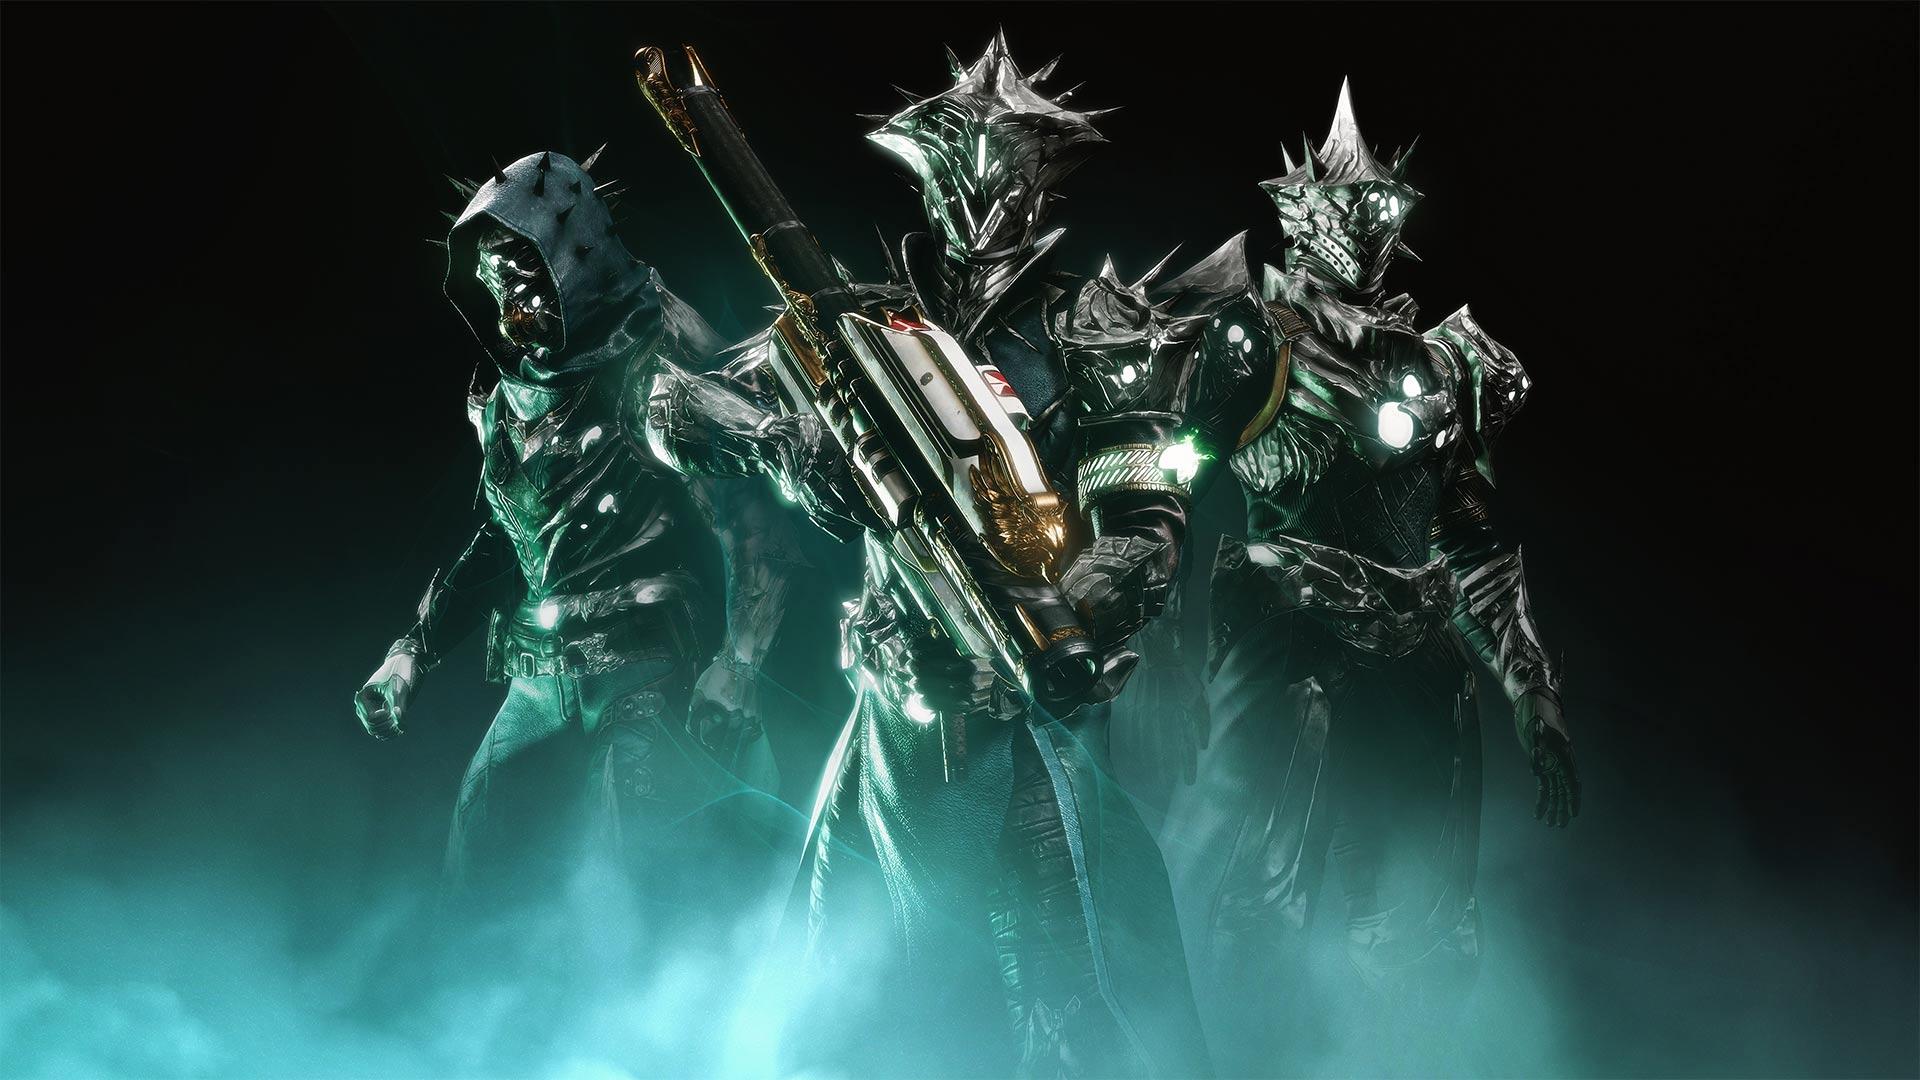 Destiny 2 30th Anniversary armor and Gjallarhorn